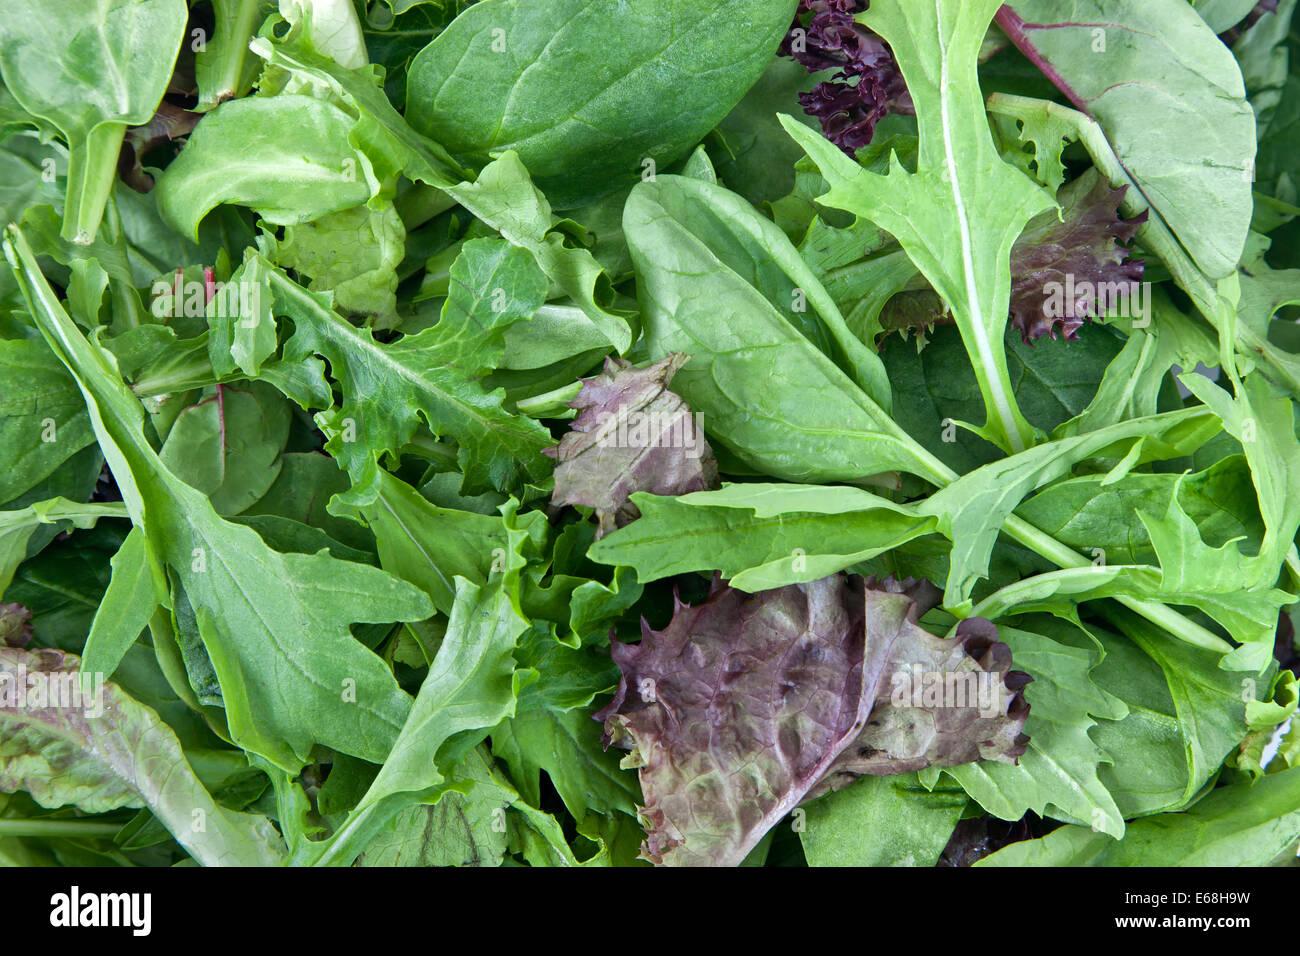 Organic baby lechuga' 'spring' ensalada mix. Imagen De Stock